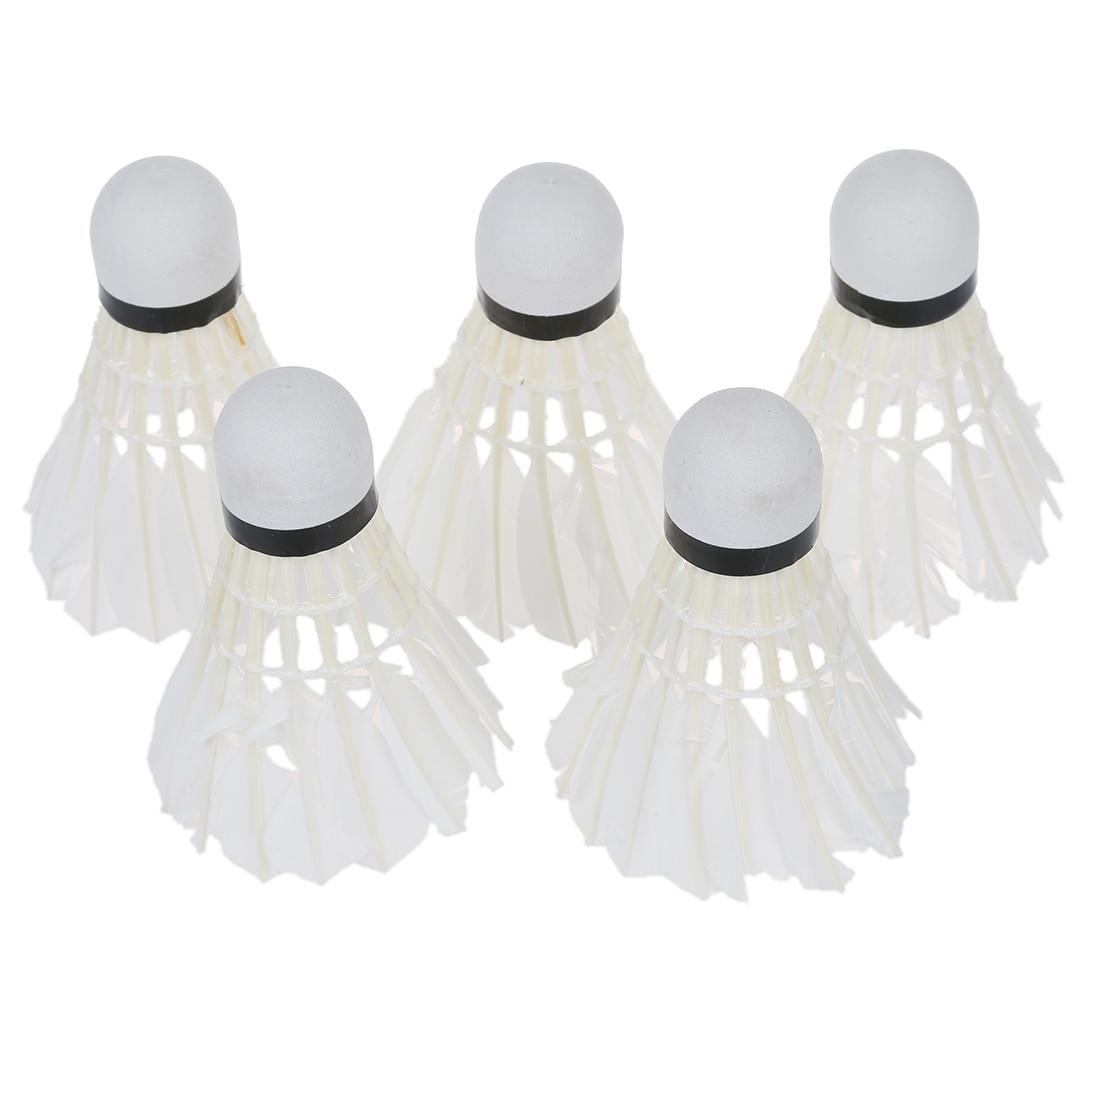 5*Dark Night LED Badminton Shuttlecock Birdies Lighting Green